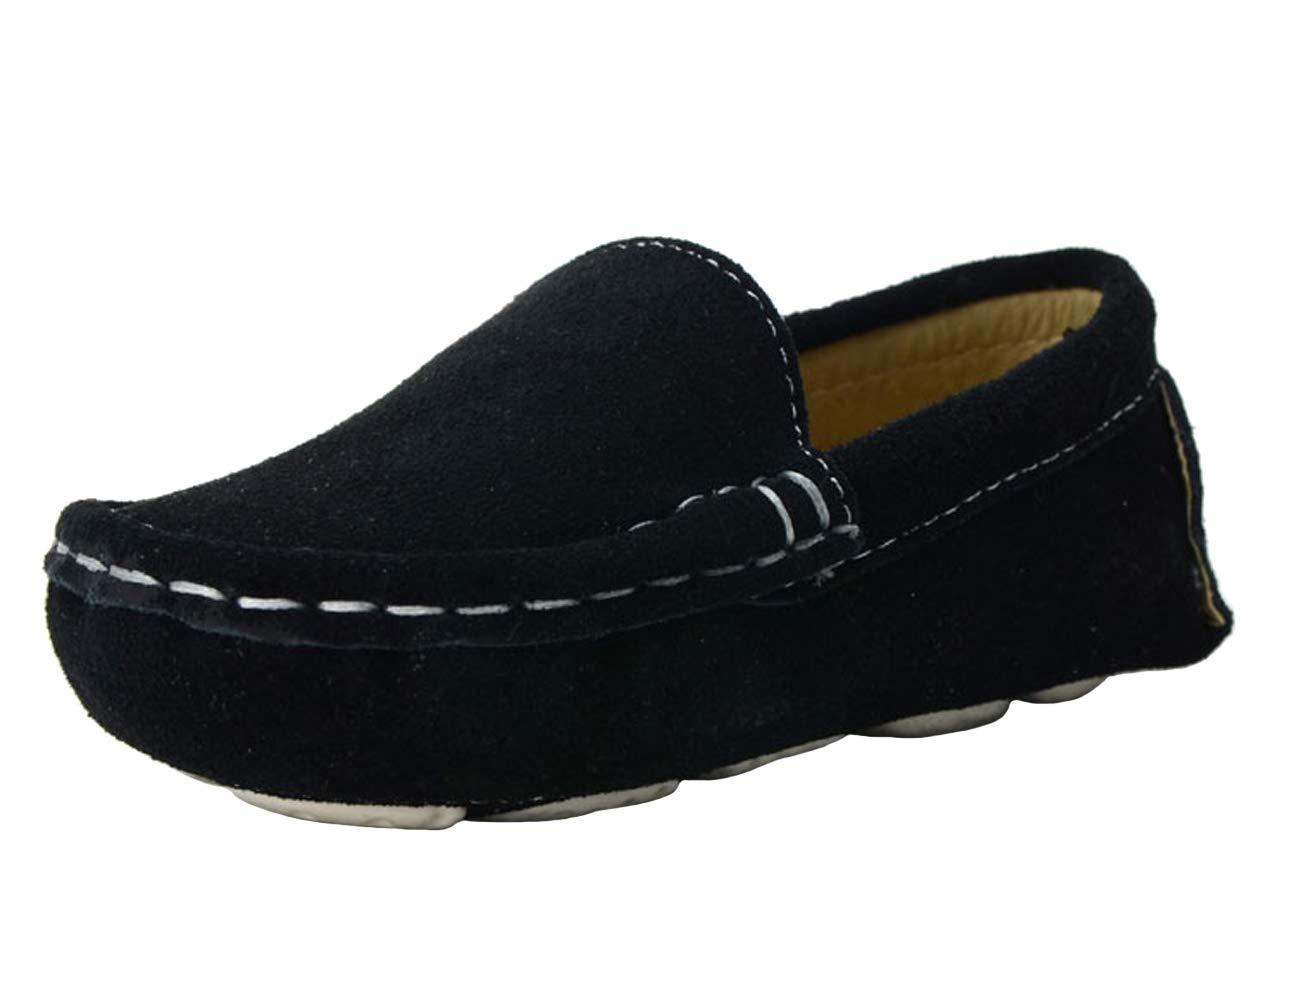 WUIWUIYU Boys' Girls' Suede Slip-On Loafers Flats Moccasins Comfort Casual Shoes Black Size 7 M by WUIWUIYU (Image #1)